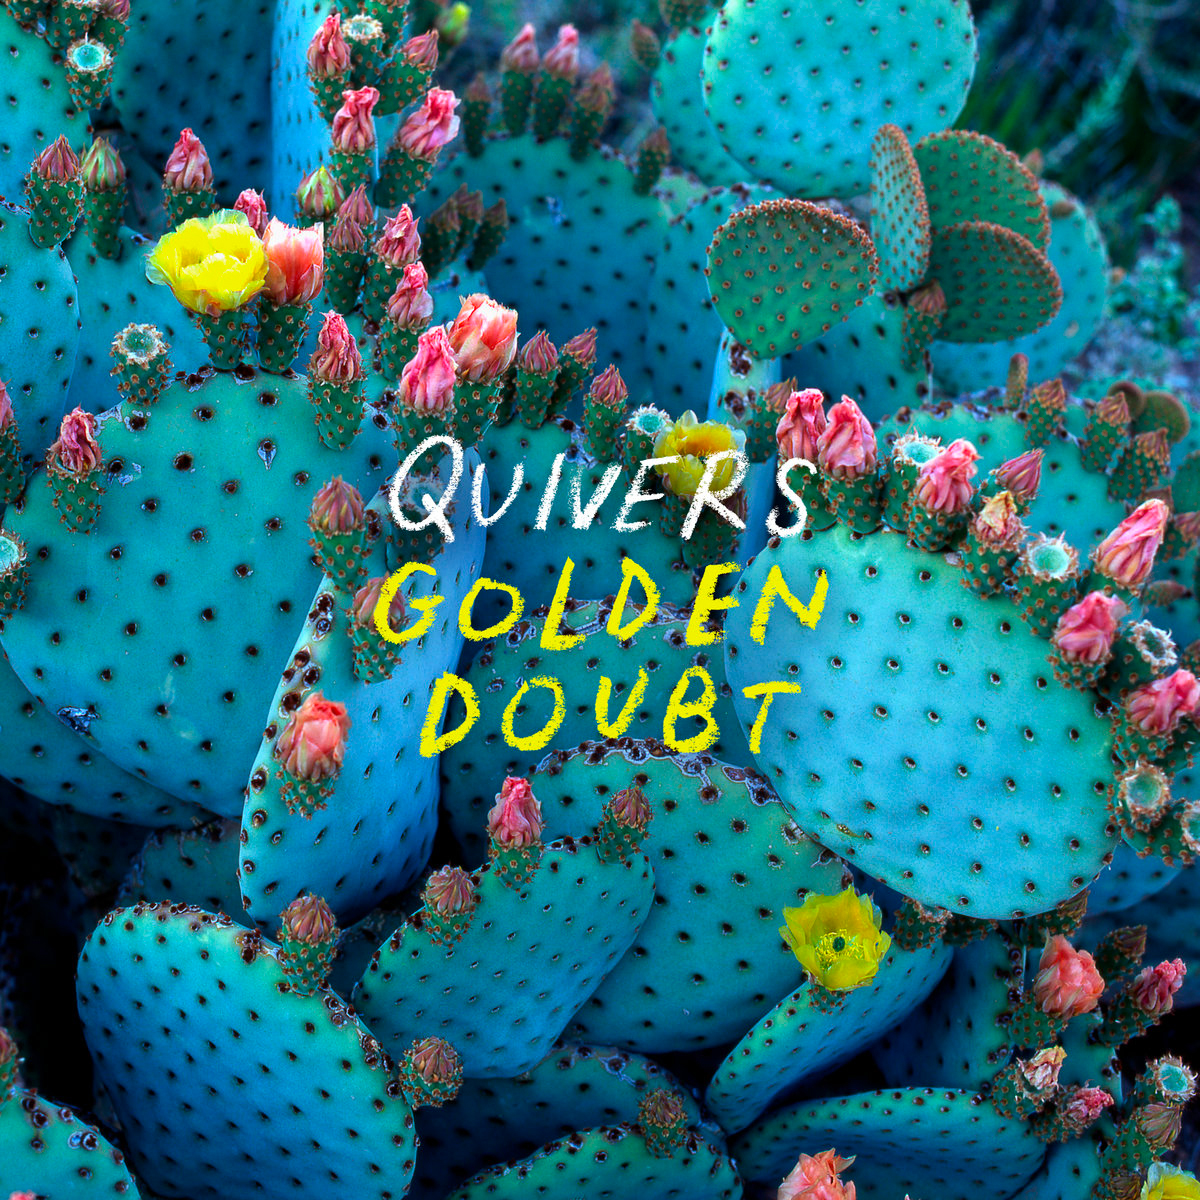 Quivers album 2021 Golden Doubt